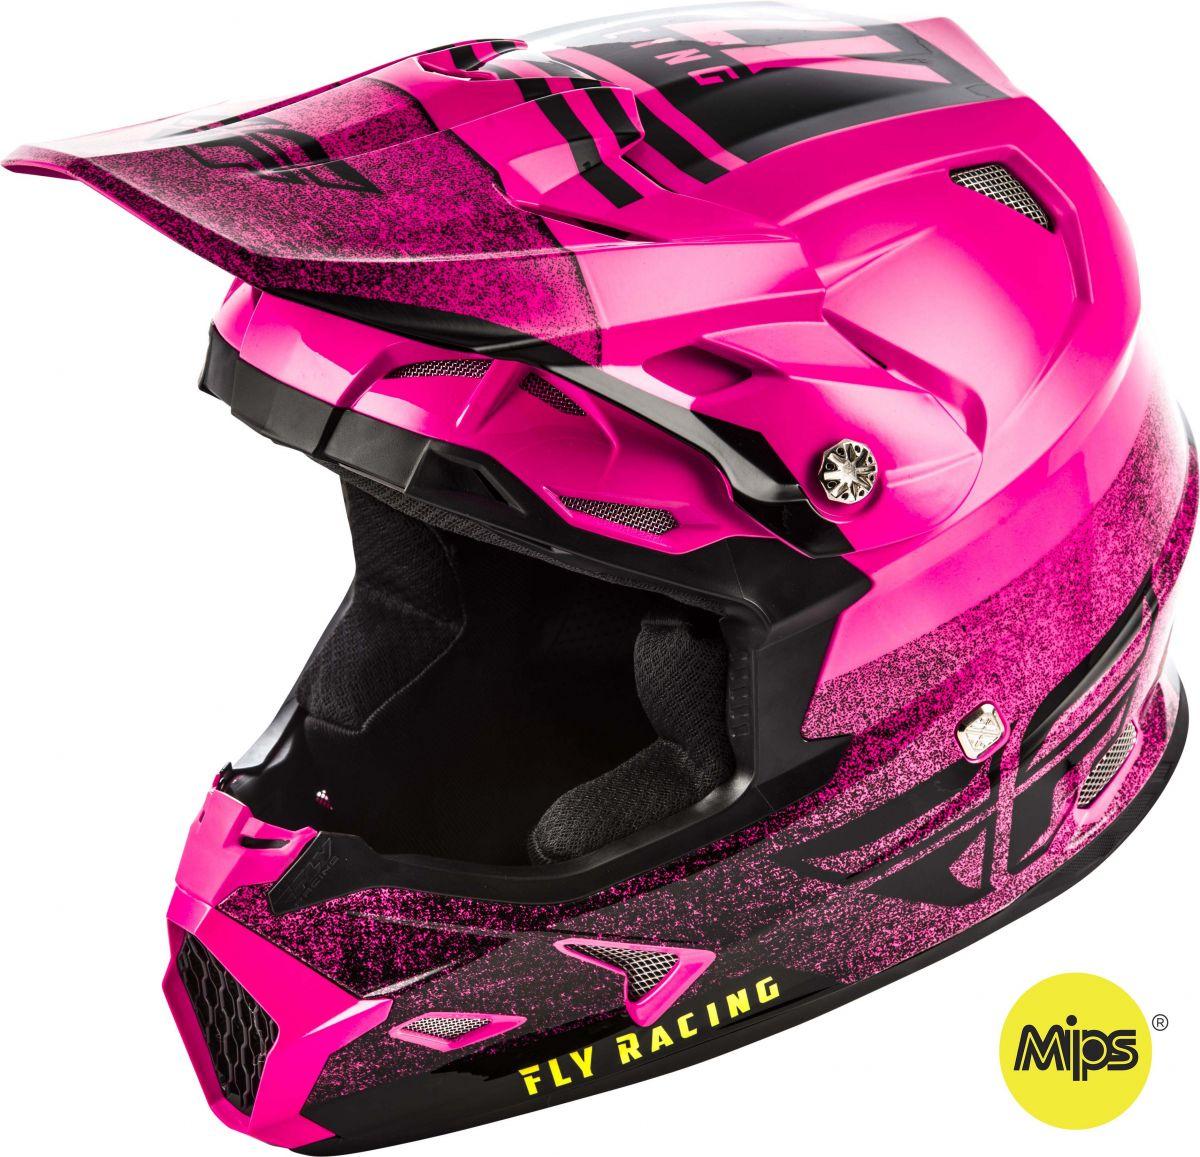 Fly - 2019 Toxin MIPS Embargo Neon Pink/Black шлем, розово-черный